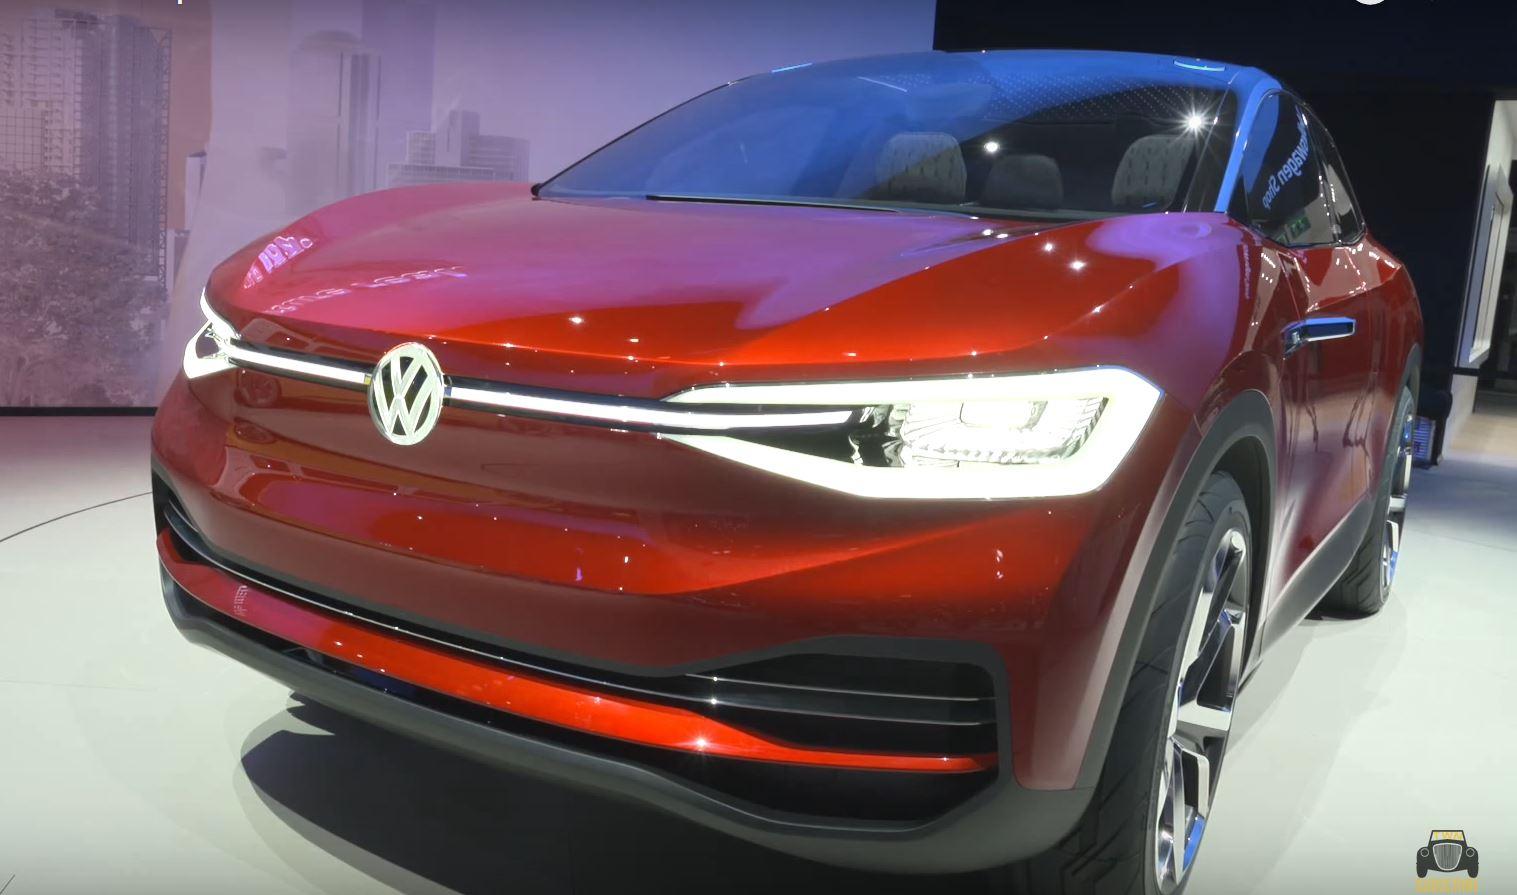 vw i d crozz ii revealed looks like the best volkswagen crossover ever autoevolution. Black Bedroom Furniture Sets. Home Design Ideas